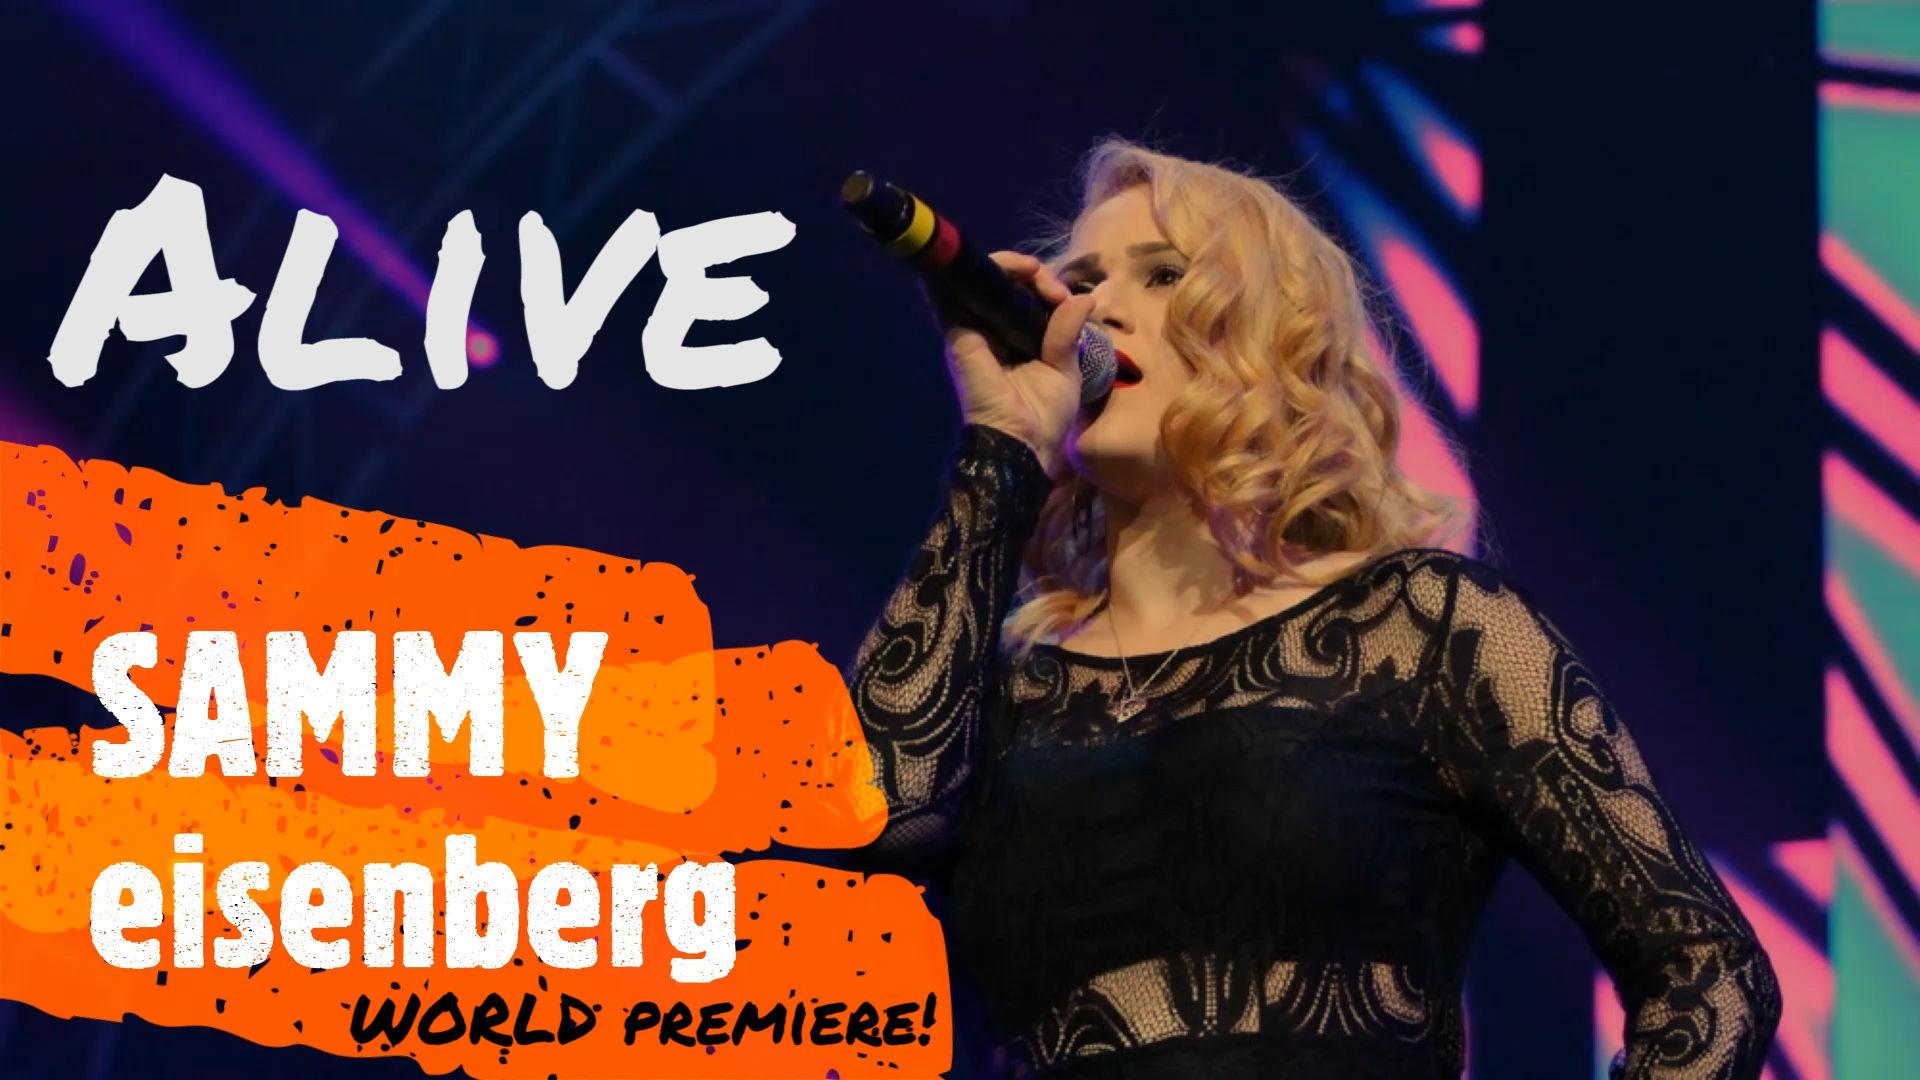 Sammy Eisenberg - ALIVE (Official Music Video)